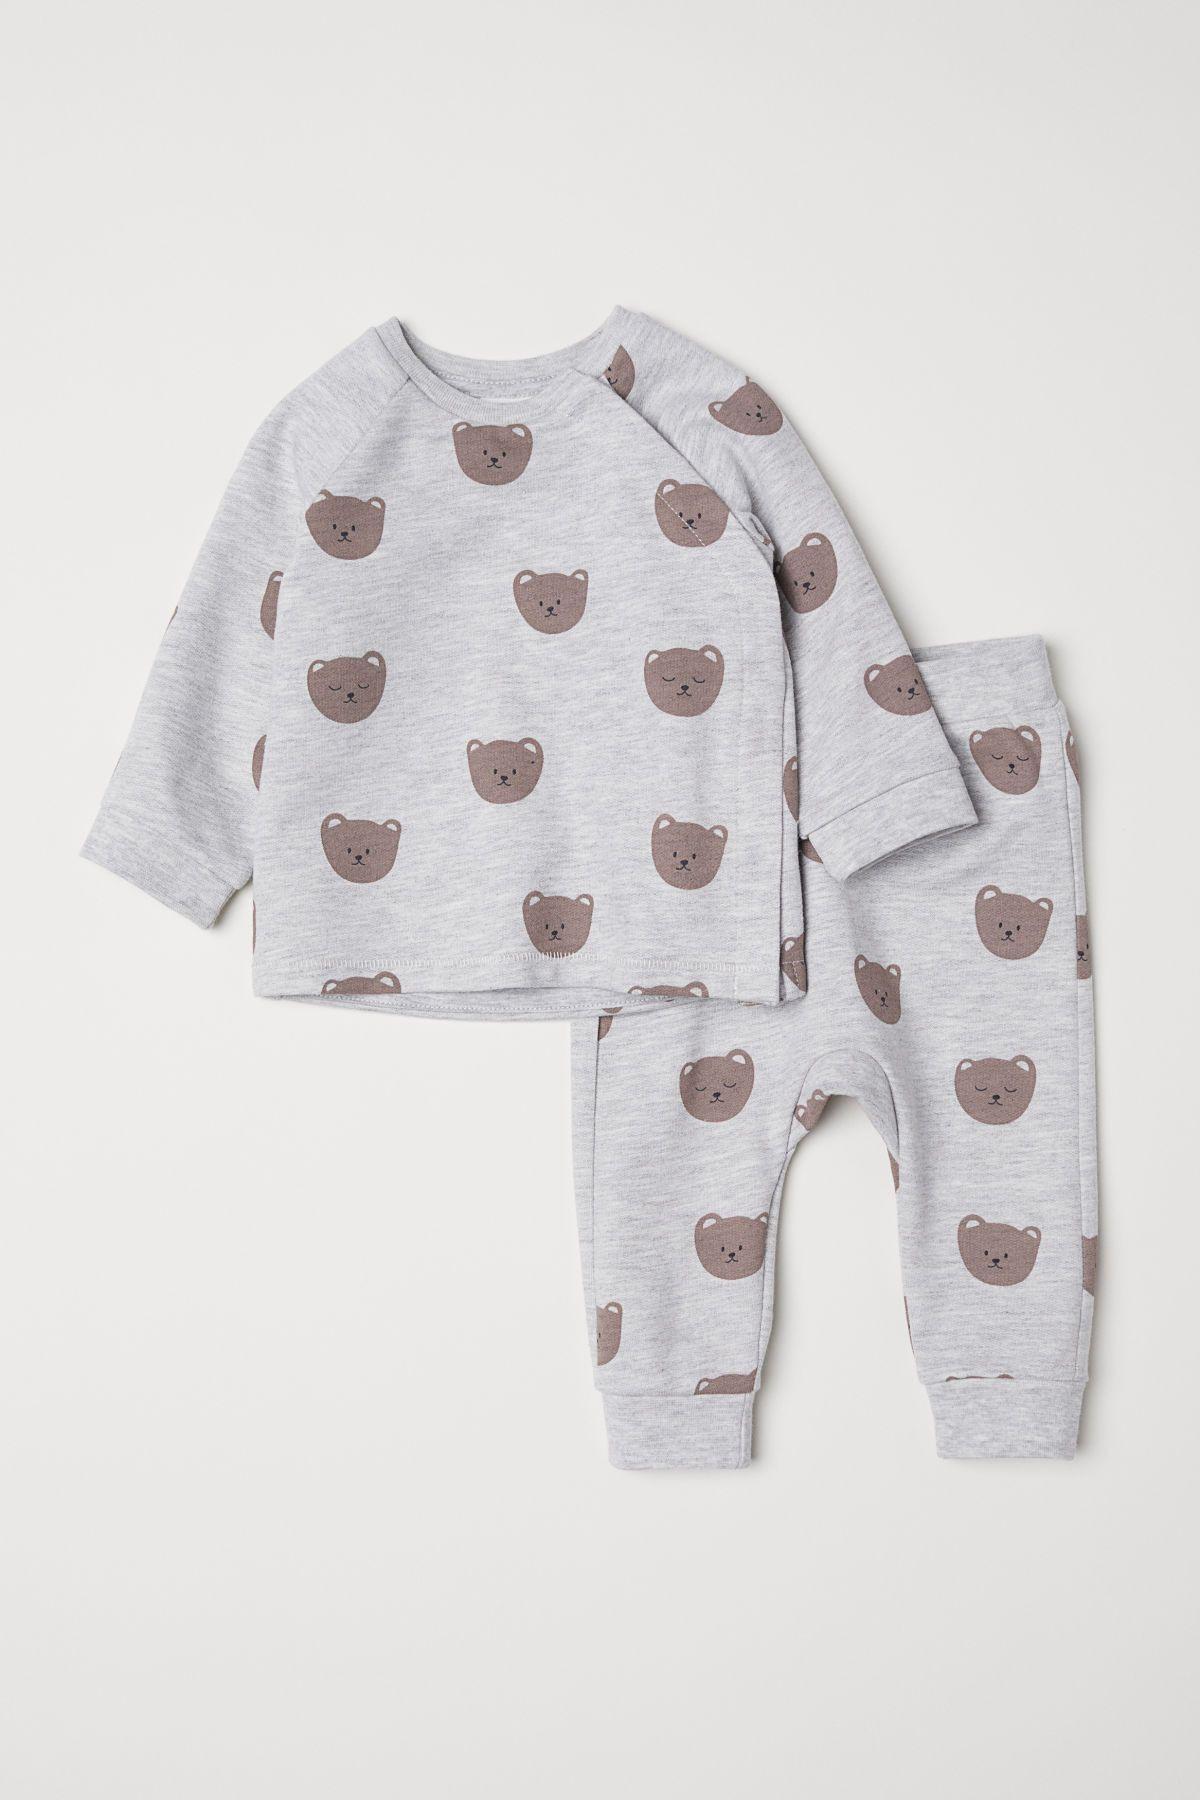 Shirt Und Hose  Hellgraumeliert/Bären  Kinder  Hm De